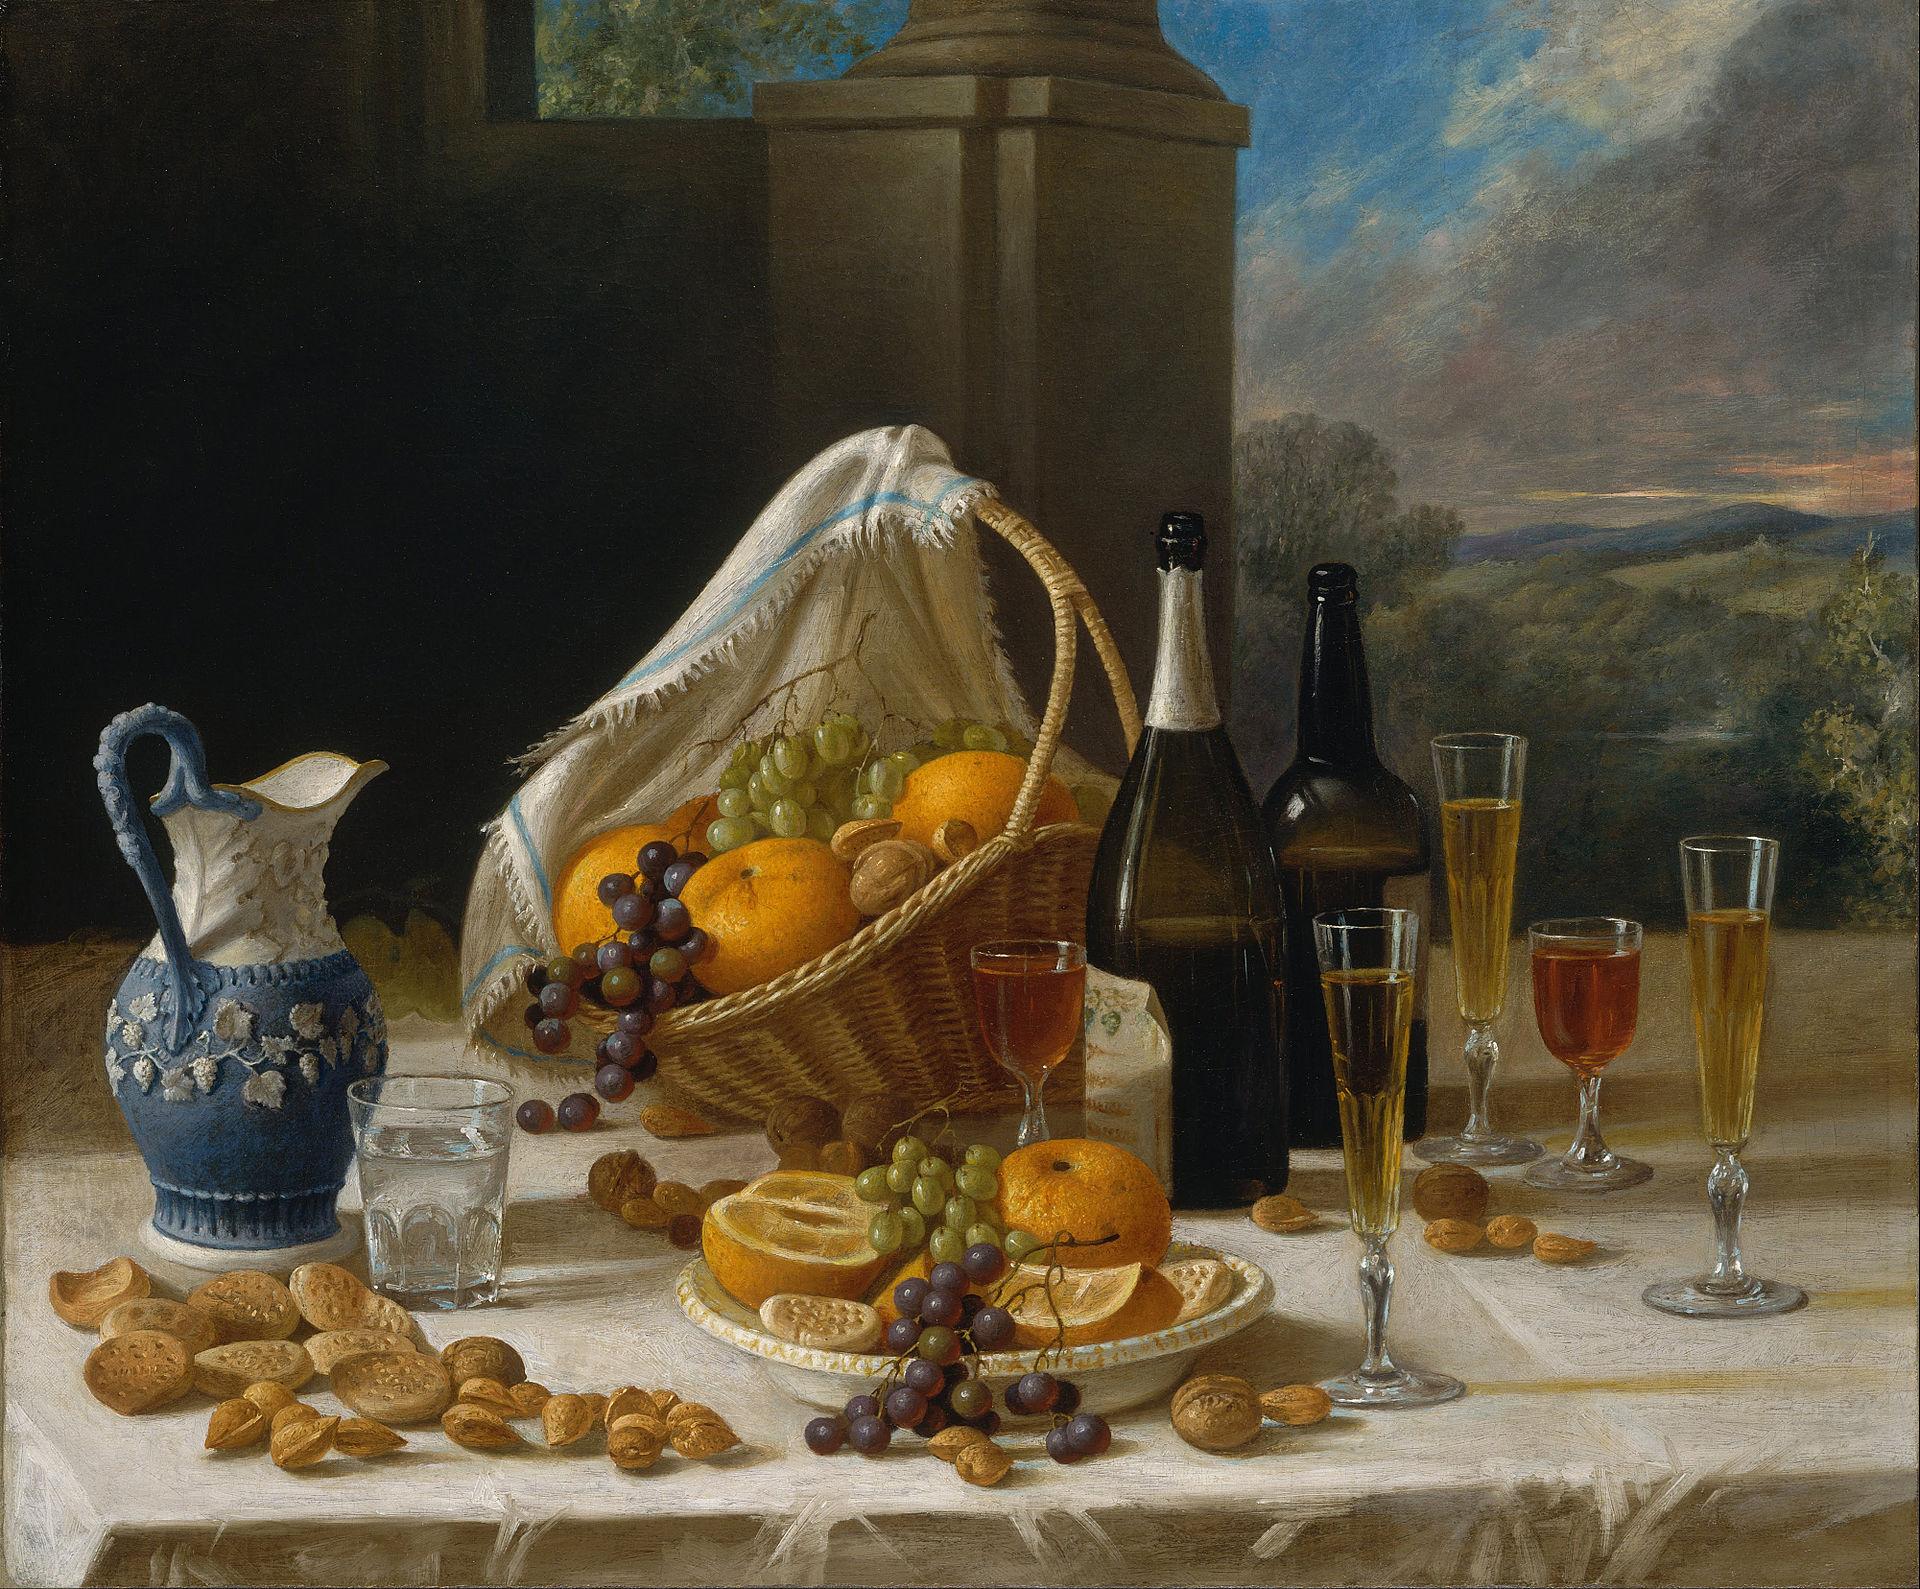 John_F._Francis_-_Luncheon_Still_Life_-_Google_Art_Project